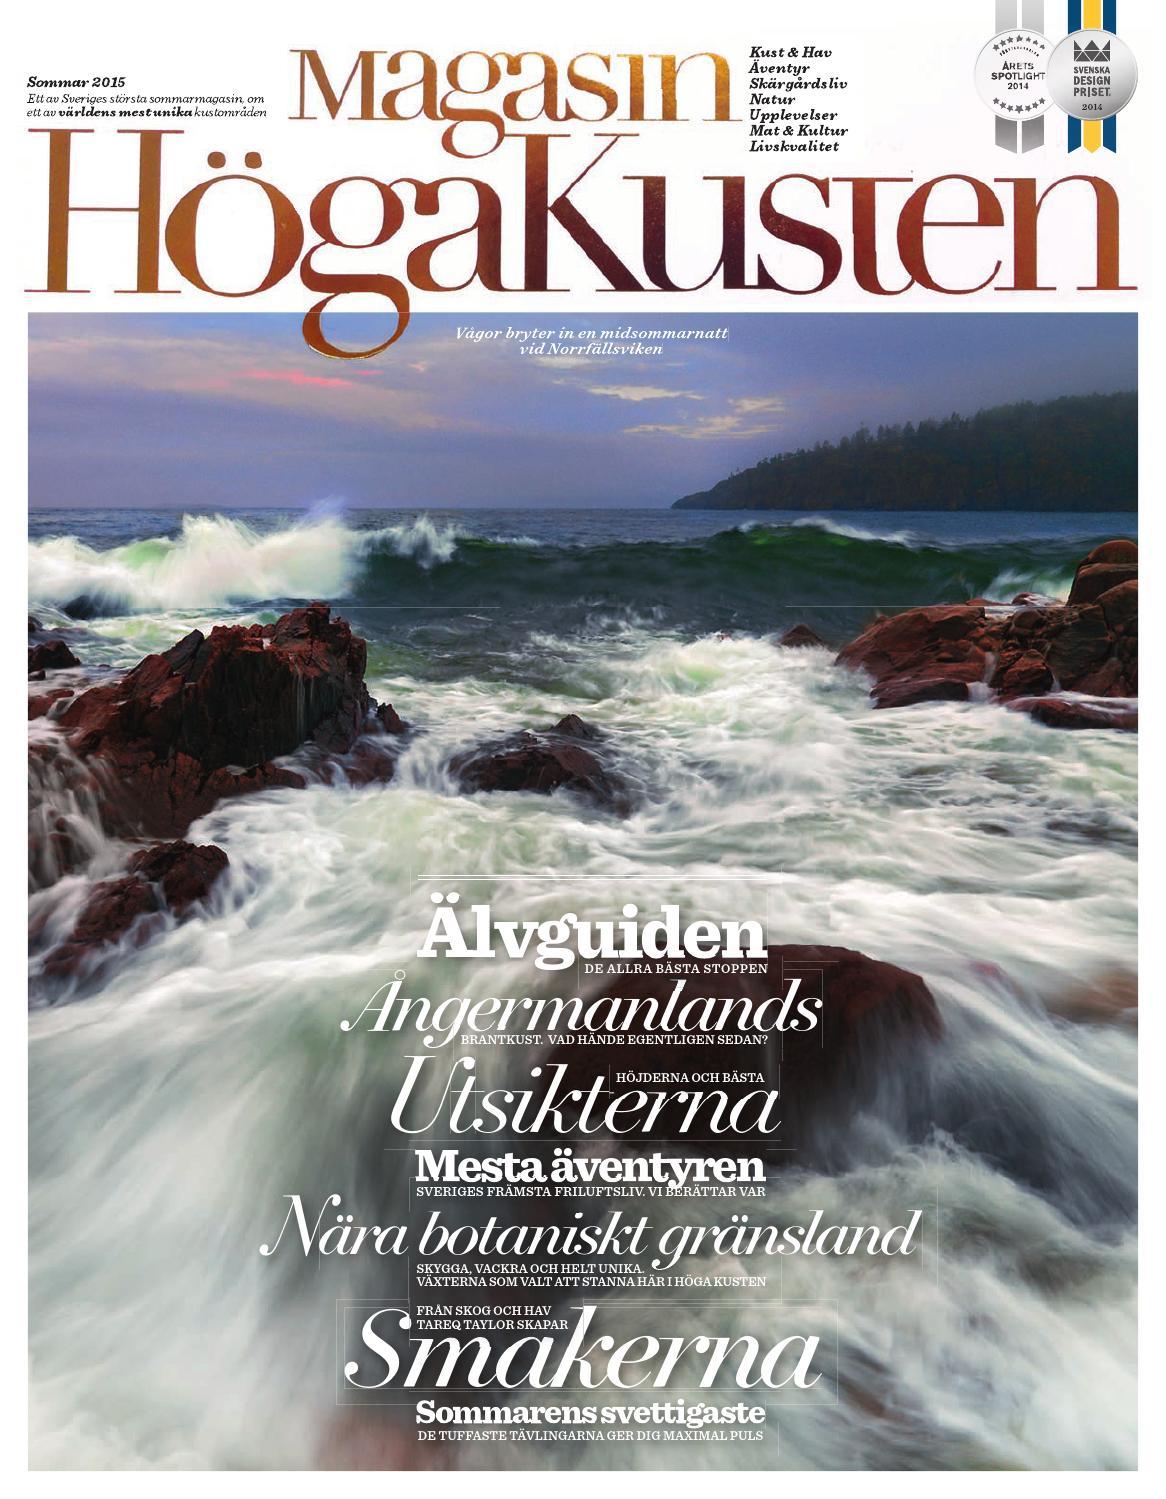 Magasin Höga Kusten 2015 by Devocy Communication - issuu 4881c6c78afda